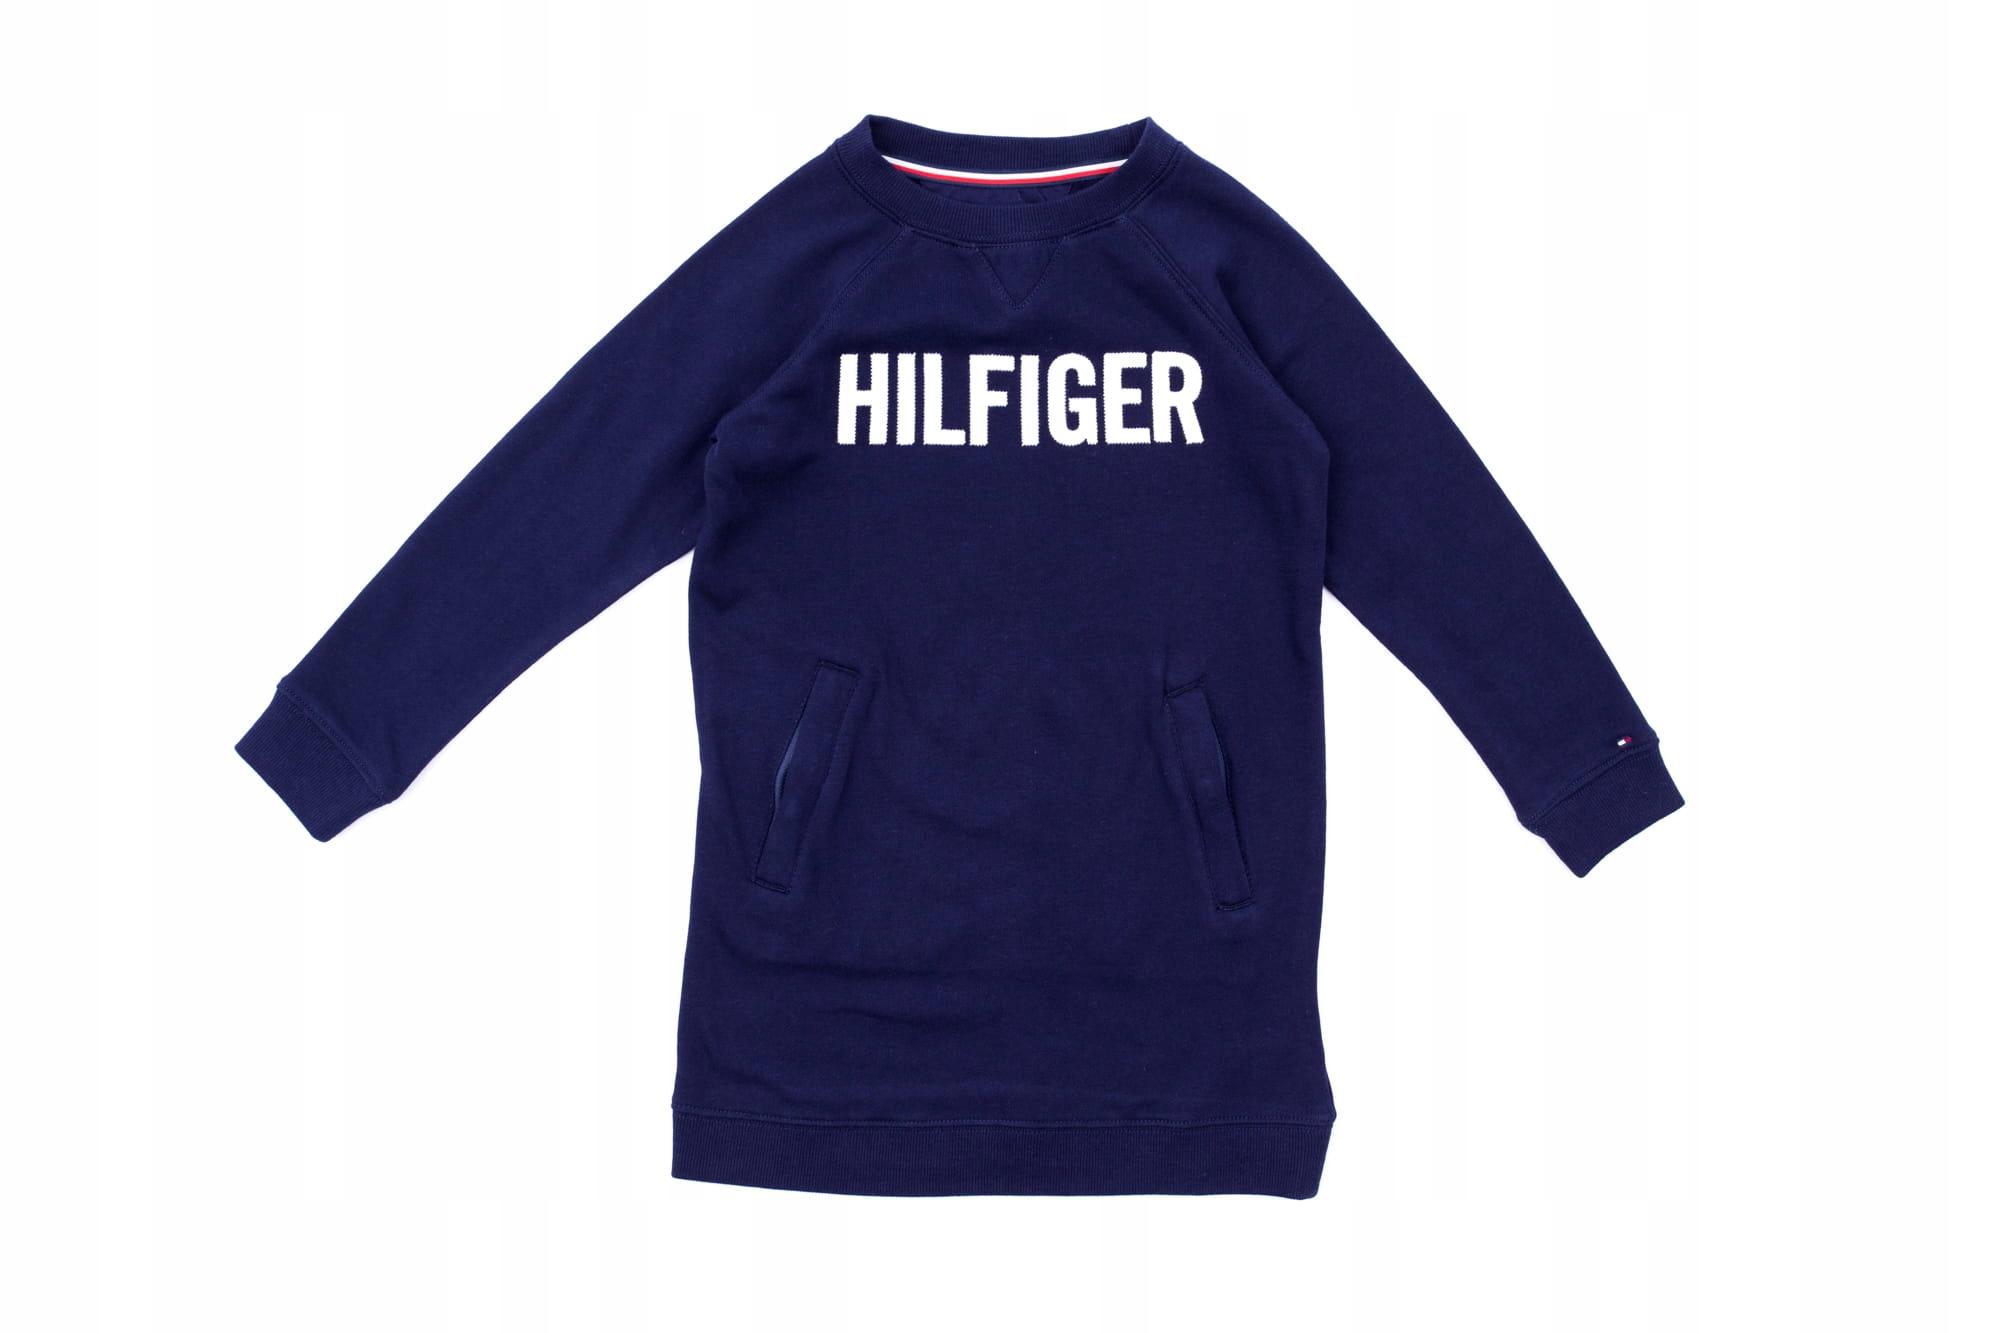 THilfiger Kids Sukienka Tunika Logo rozm. 2 lata